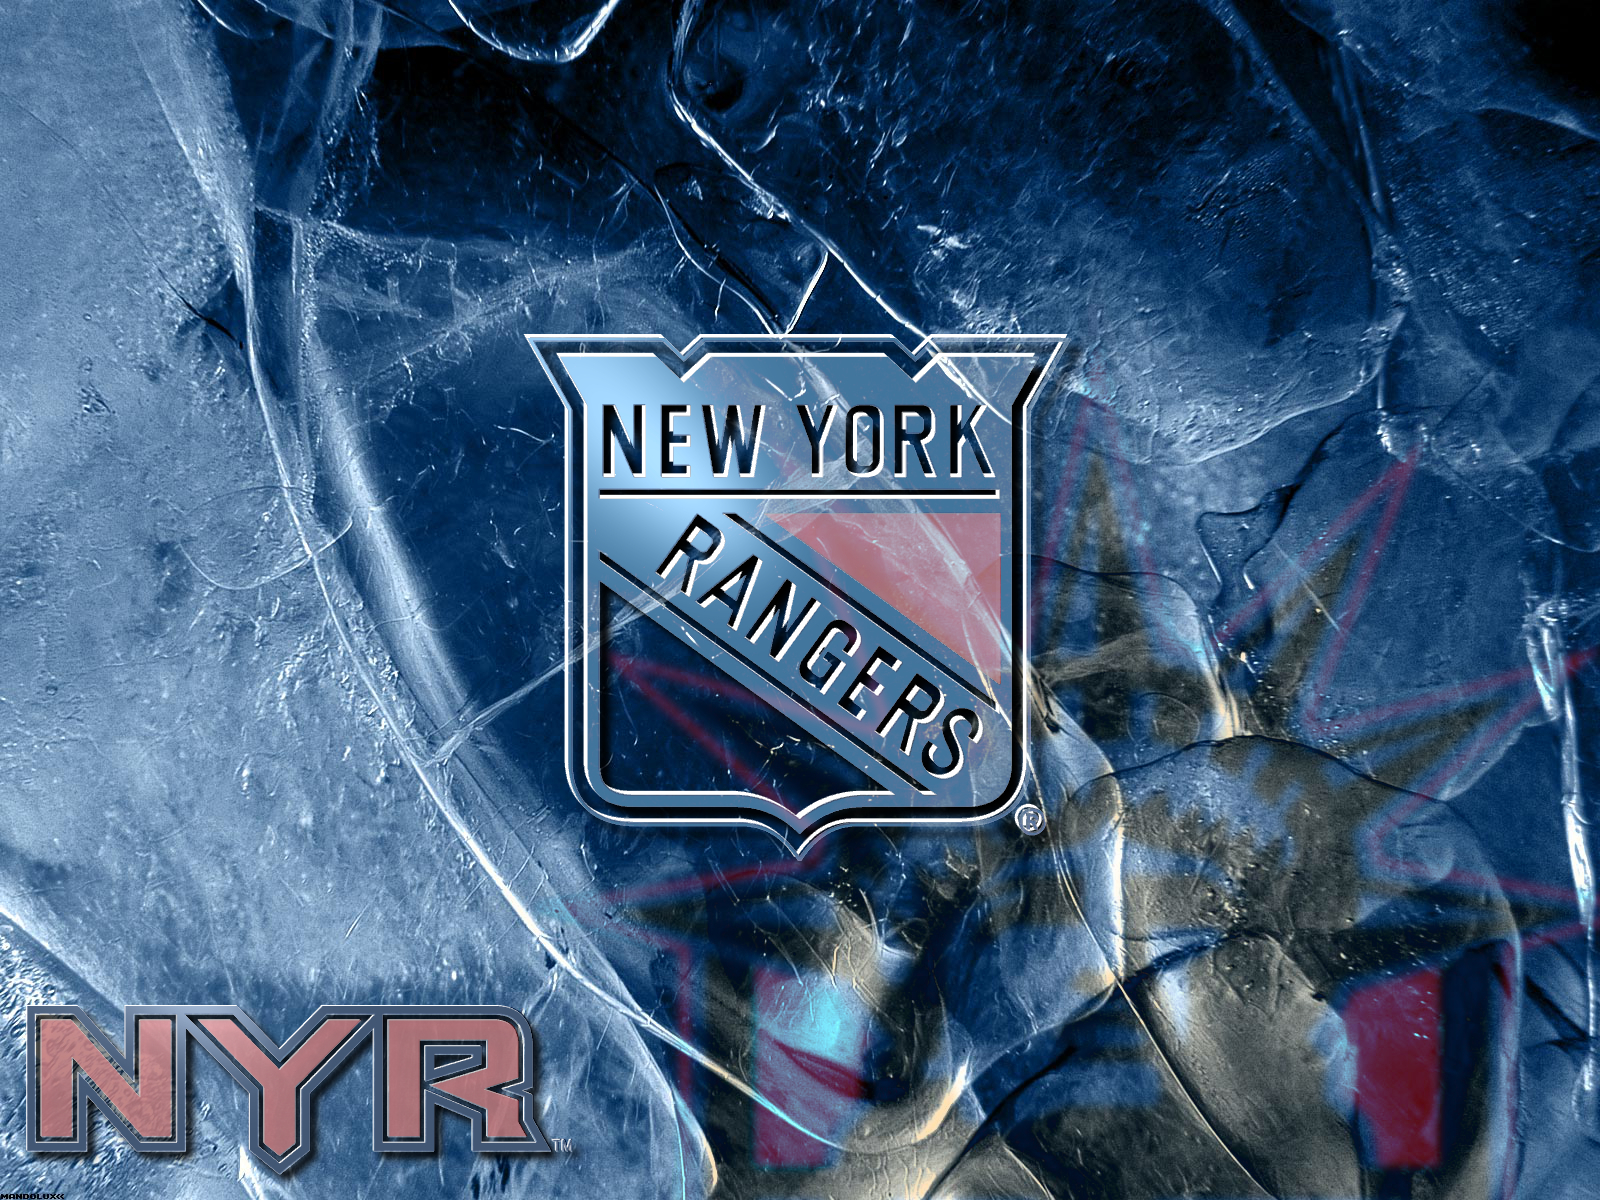 NHL New York Rangers by Realyze